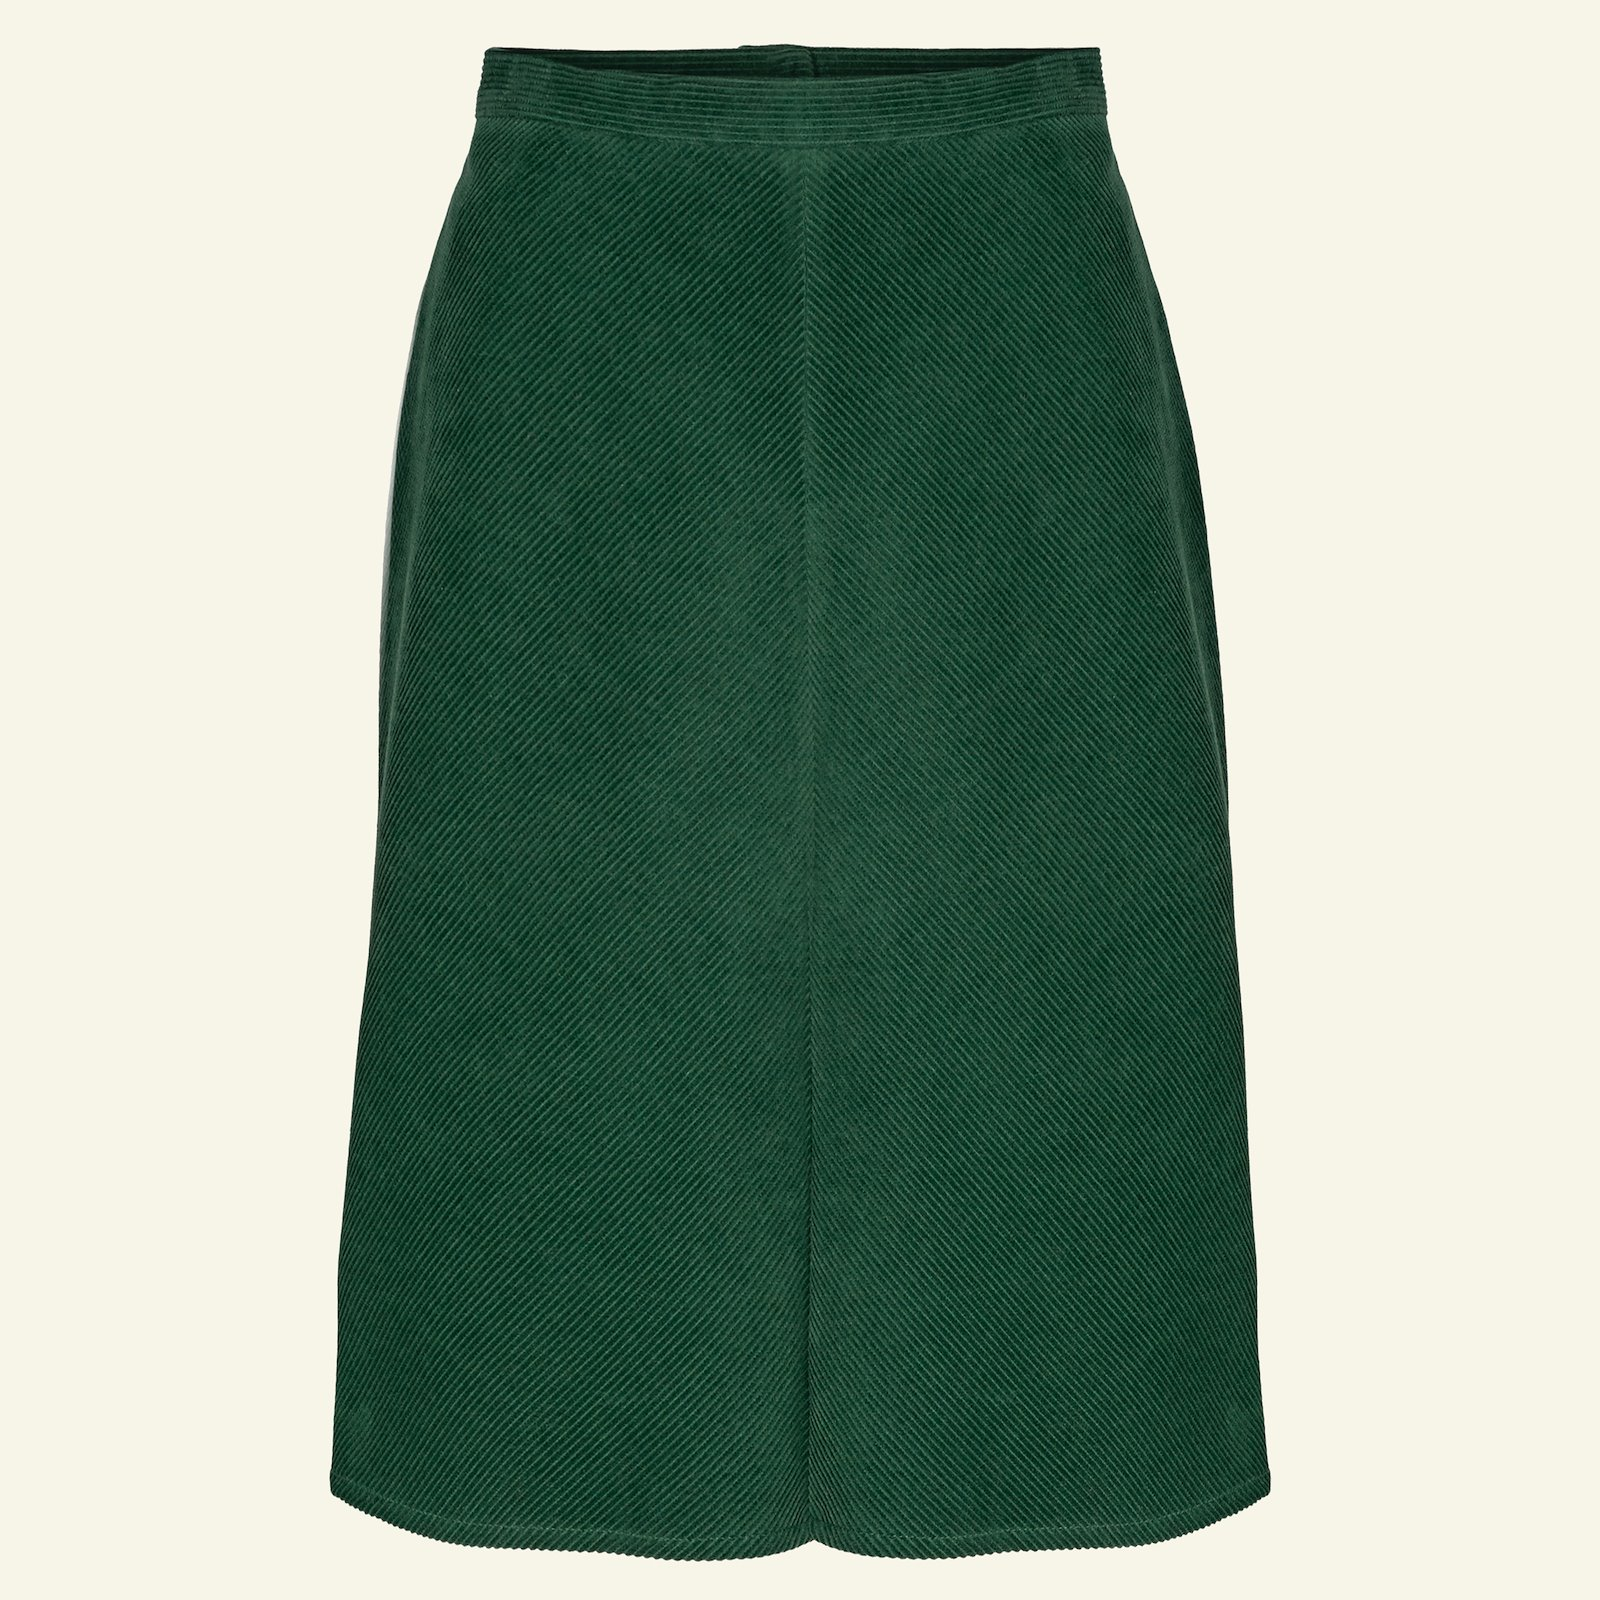 Skirt with A-shape, 44/16 p21038_430819_sskit